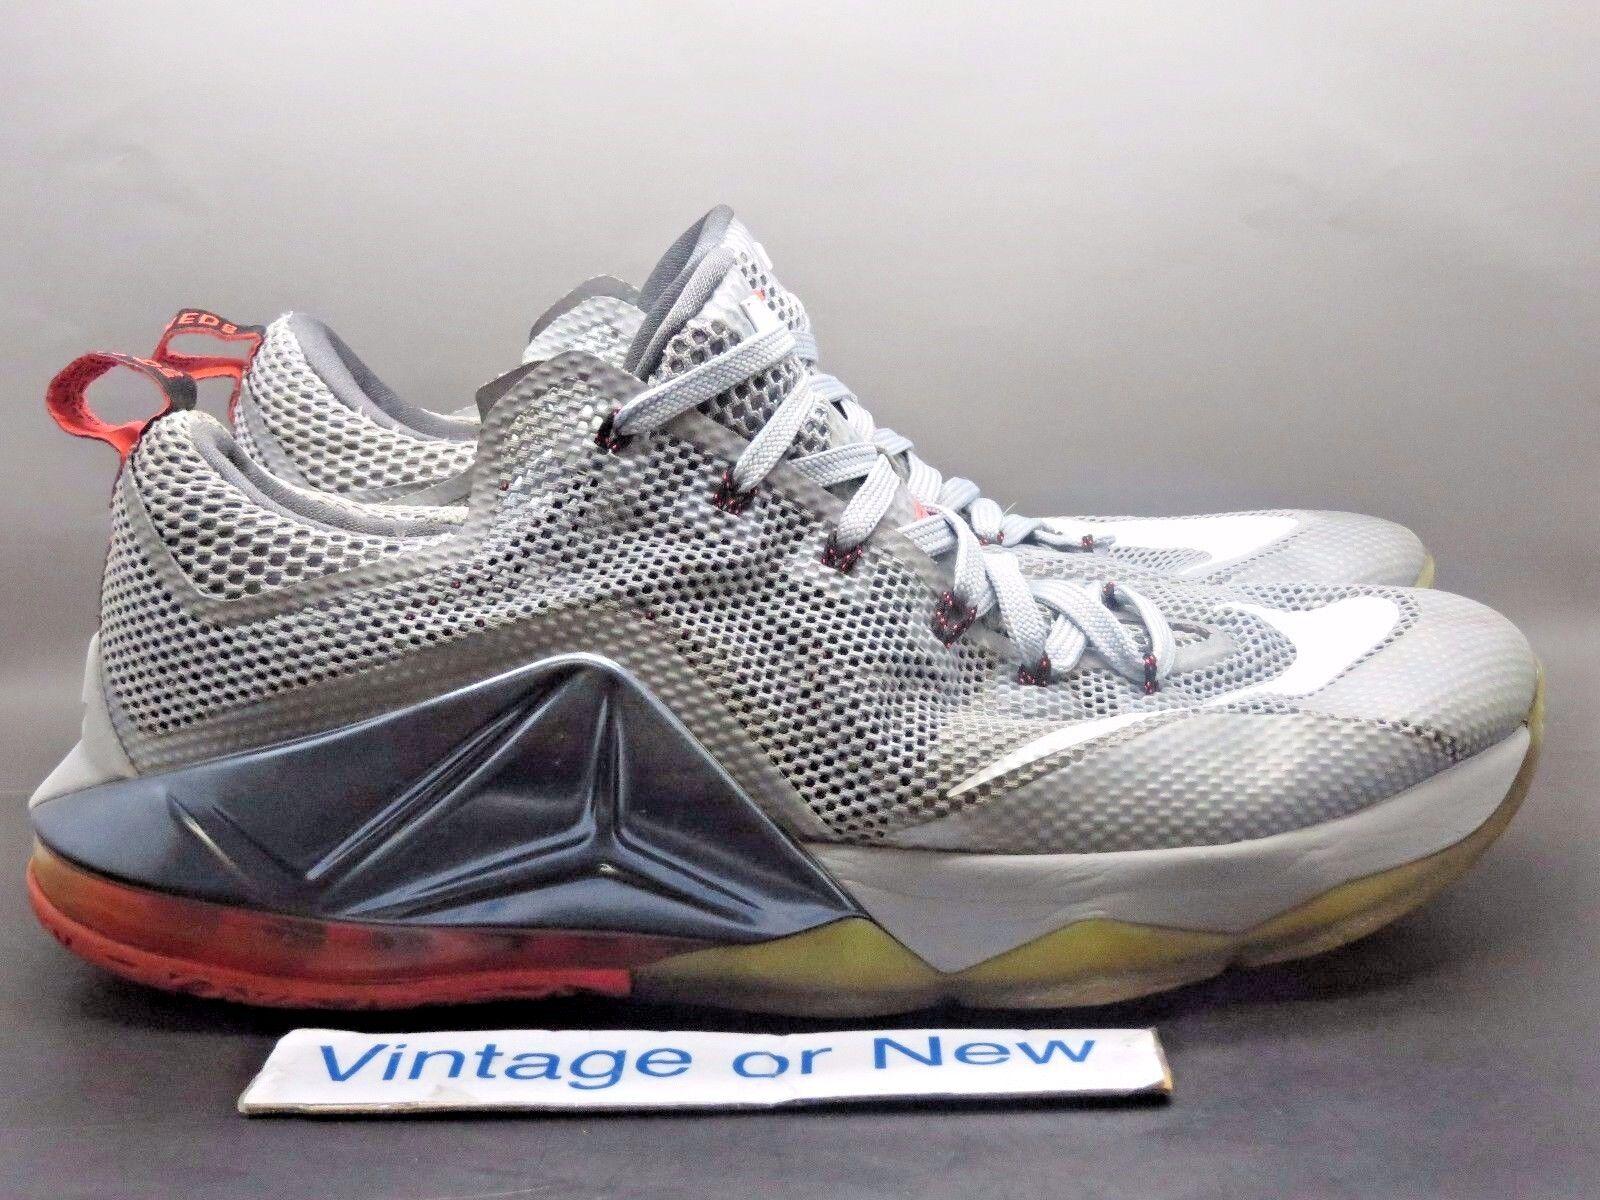 promo code 1c462 e3e06 Nike LeBron LeBron LeBron XII 12 Low Wolf Grey White Hot Lava sz 13 c675d1